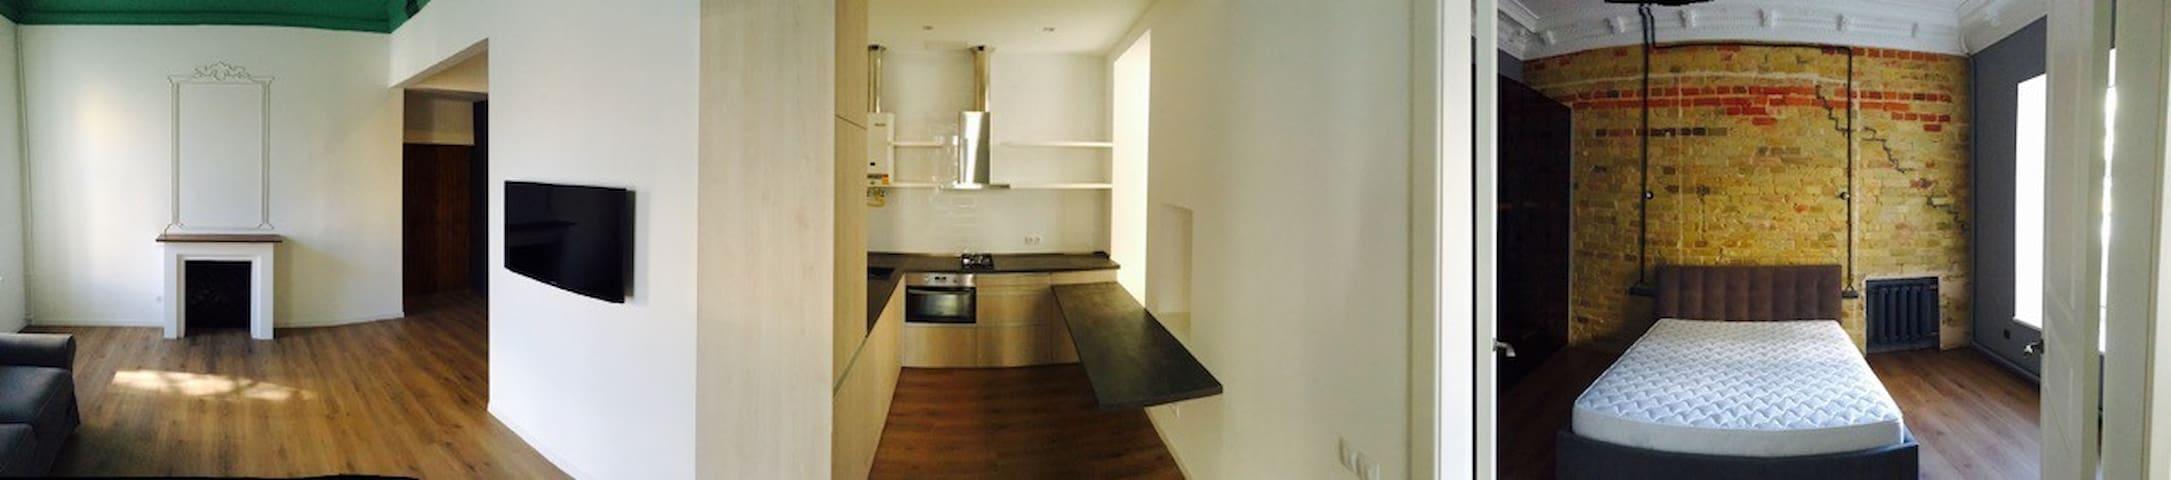 New flat in the heart of Kiev city